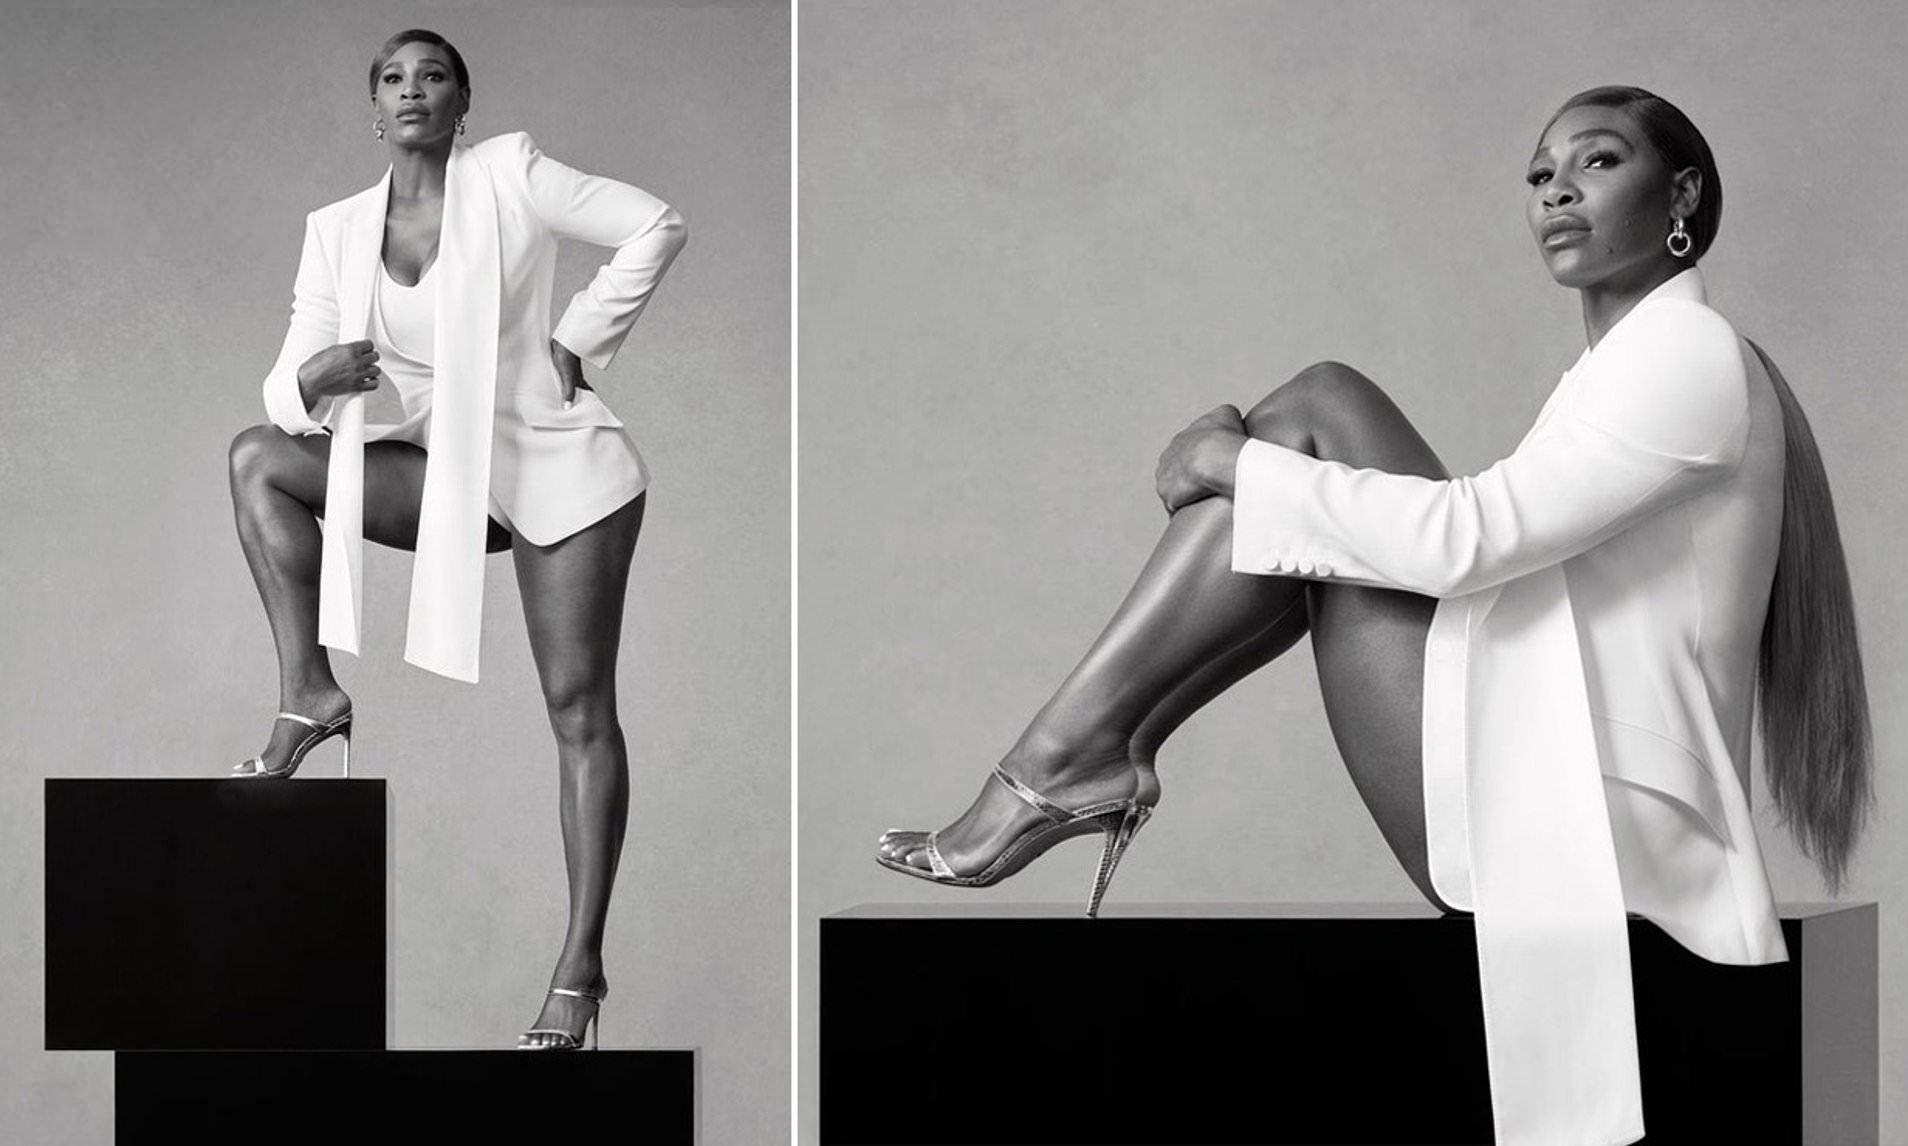 Serena Williams poses for stunning Stuart Weitzman